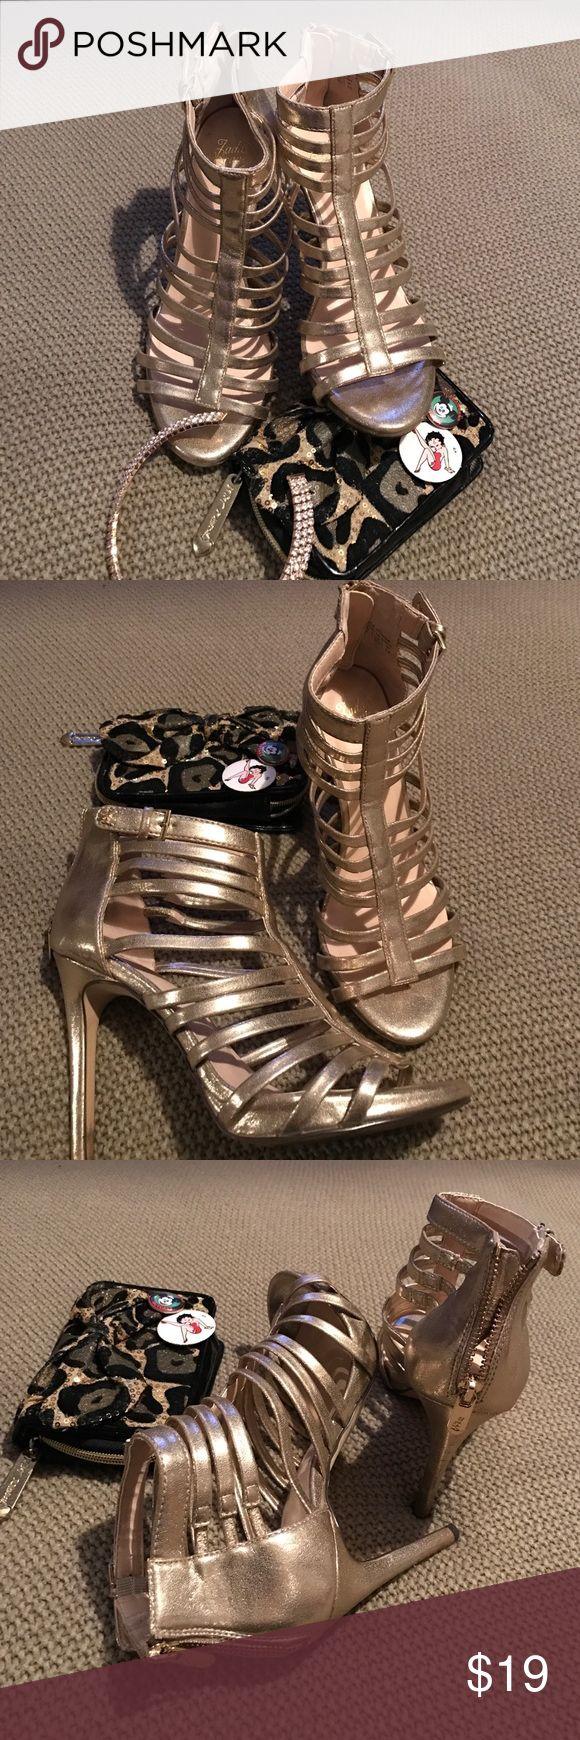 Gold sandal heels ⭐️✨⚡️🌼 Gold metallic heels. Back zipper and ankle strap. Worn once. jada brave Shoes Heels